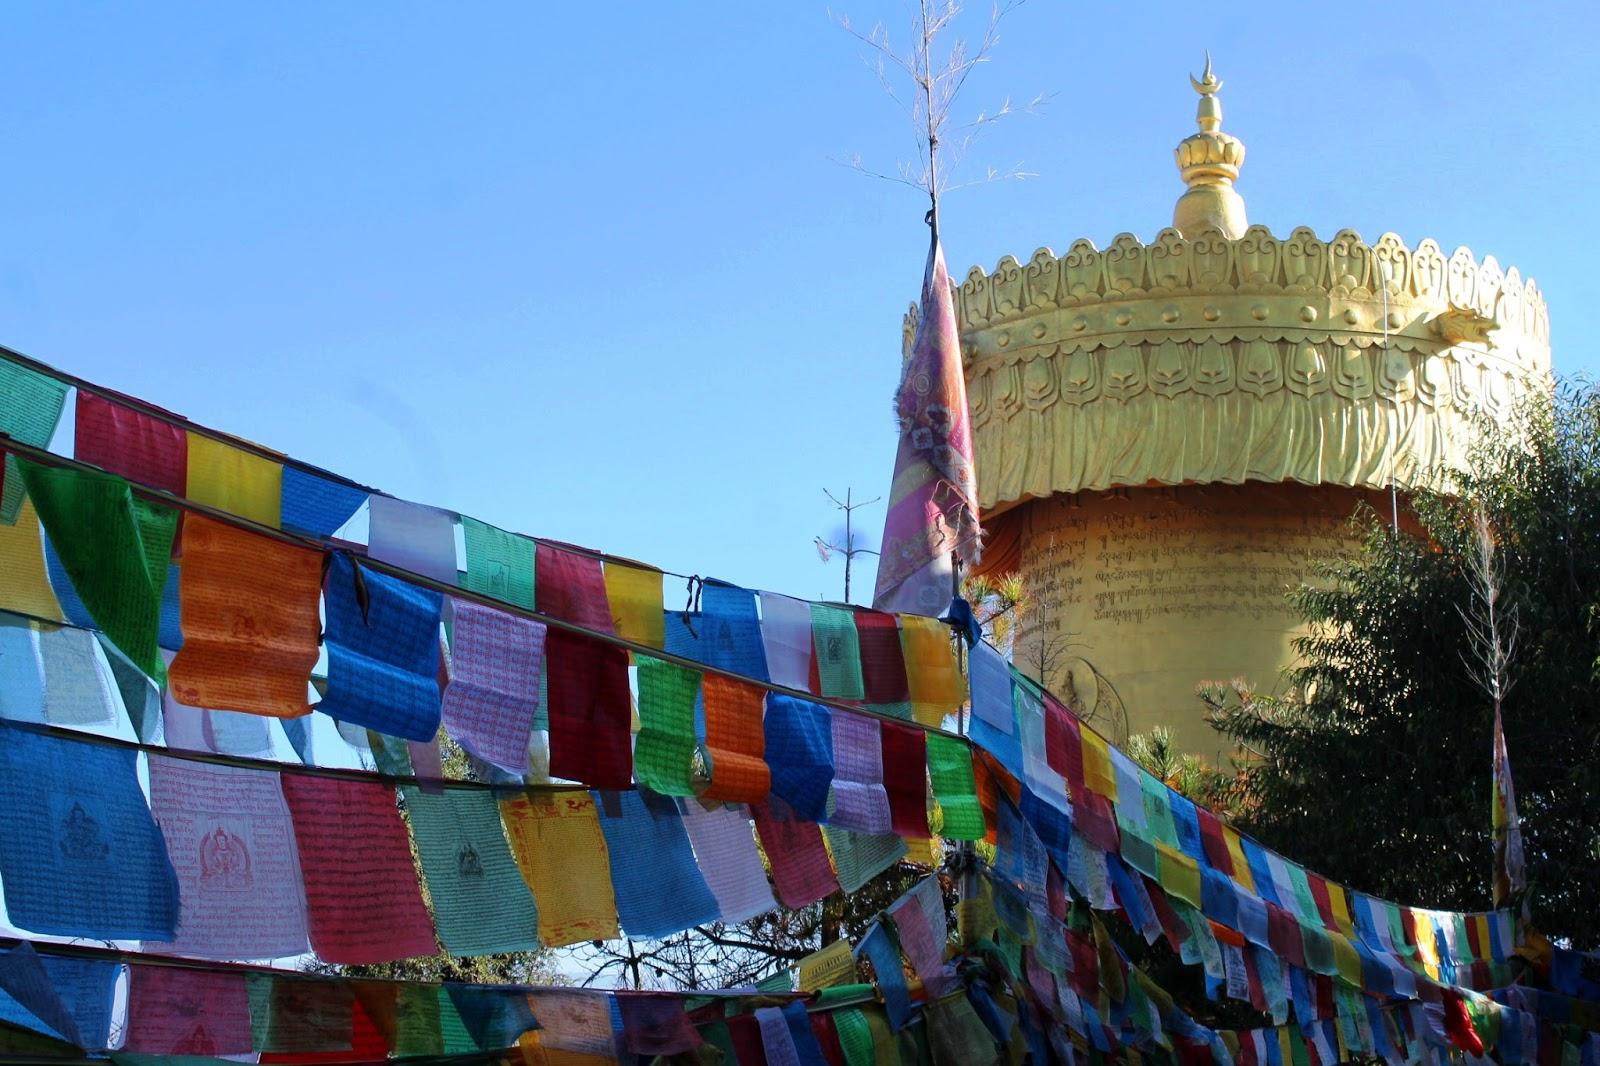 Ruota di preghiera, Shangri-la – Cina